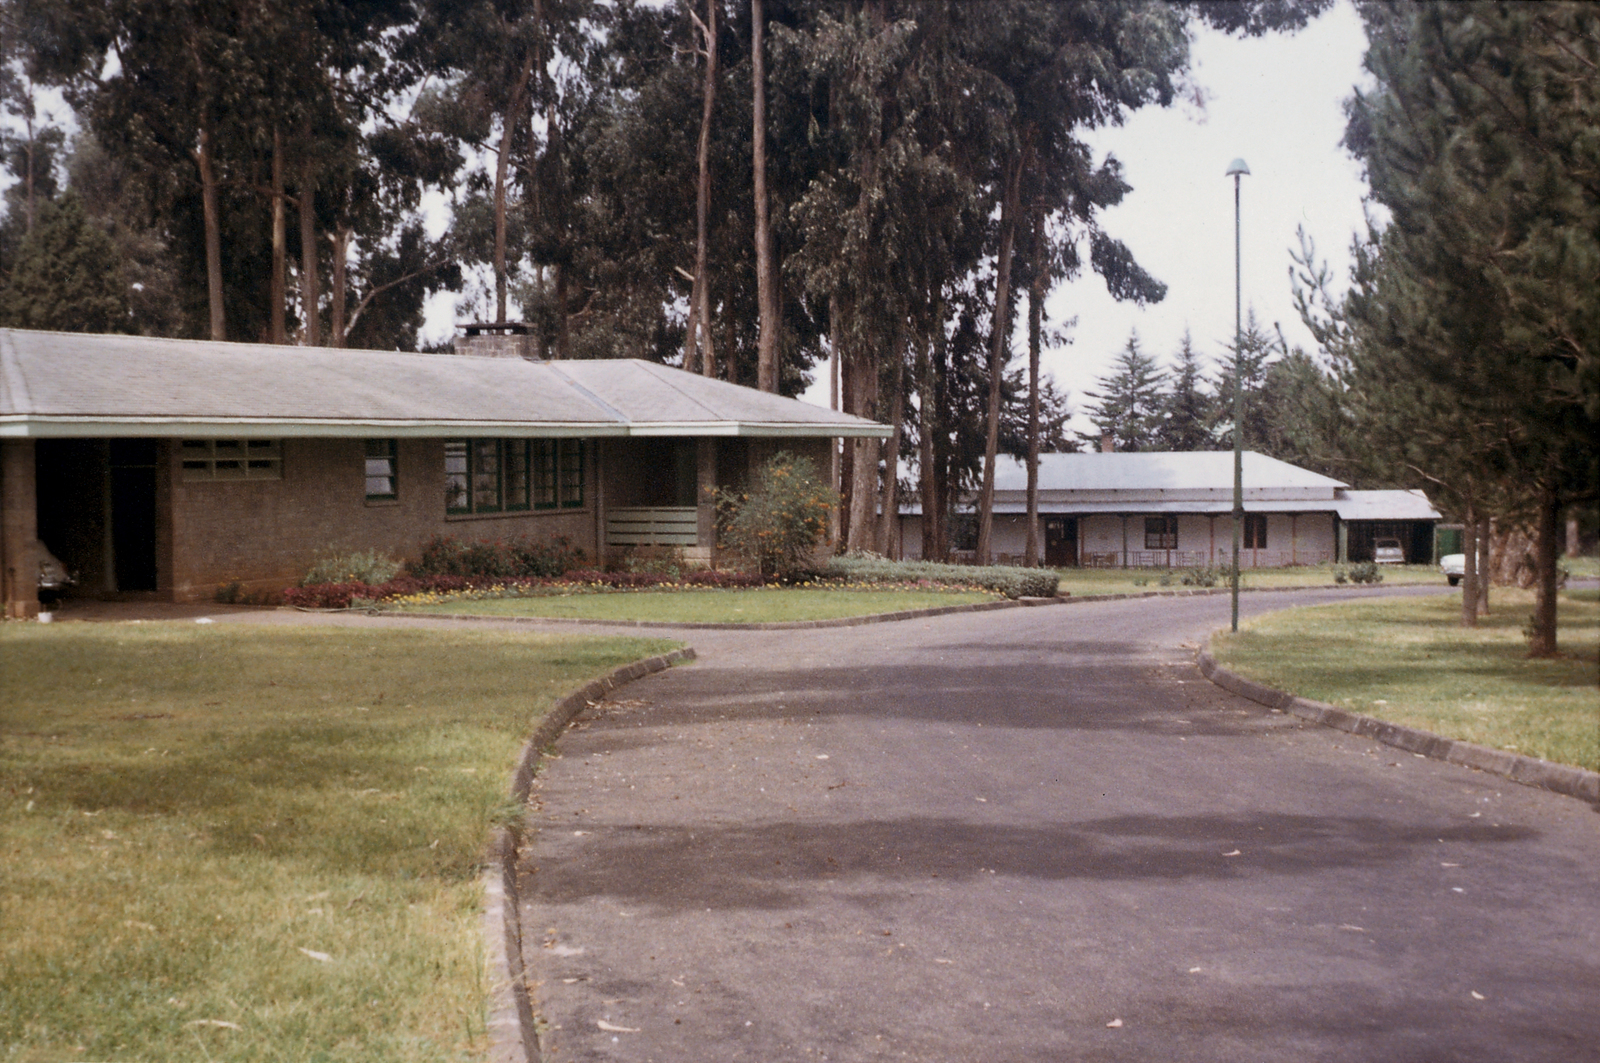 Addis Ababa - Standard Level Position Residence - 1967